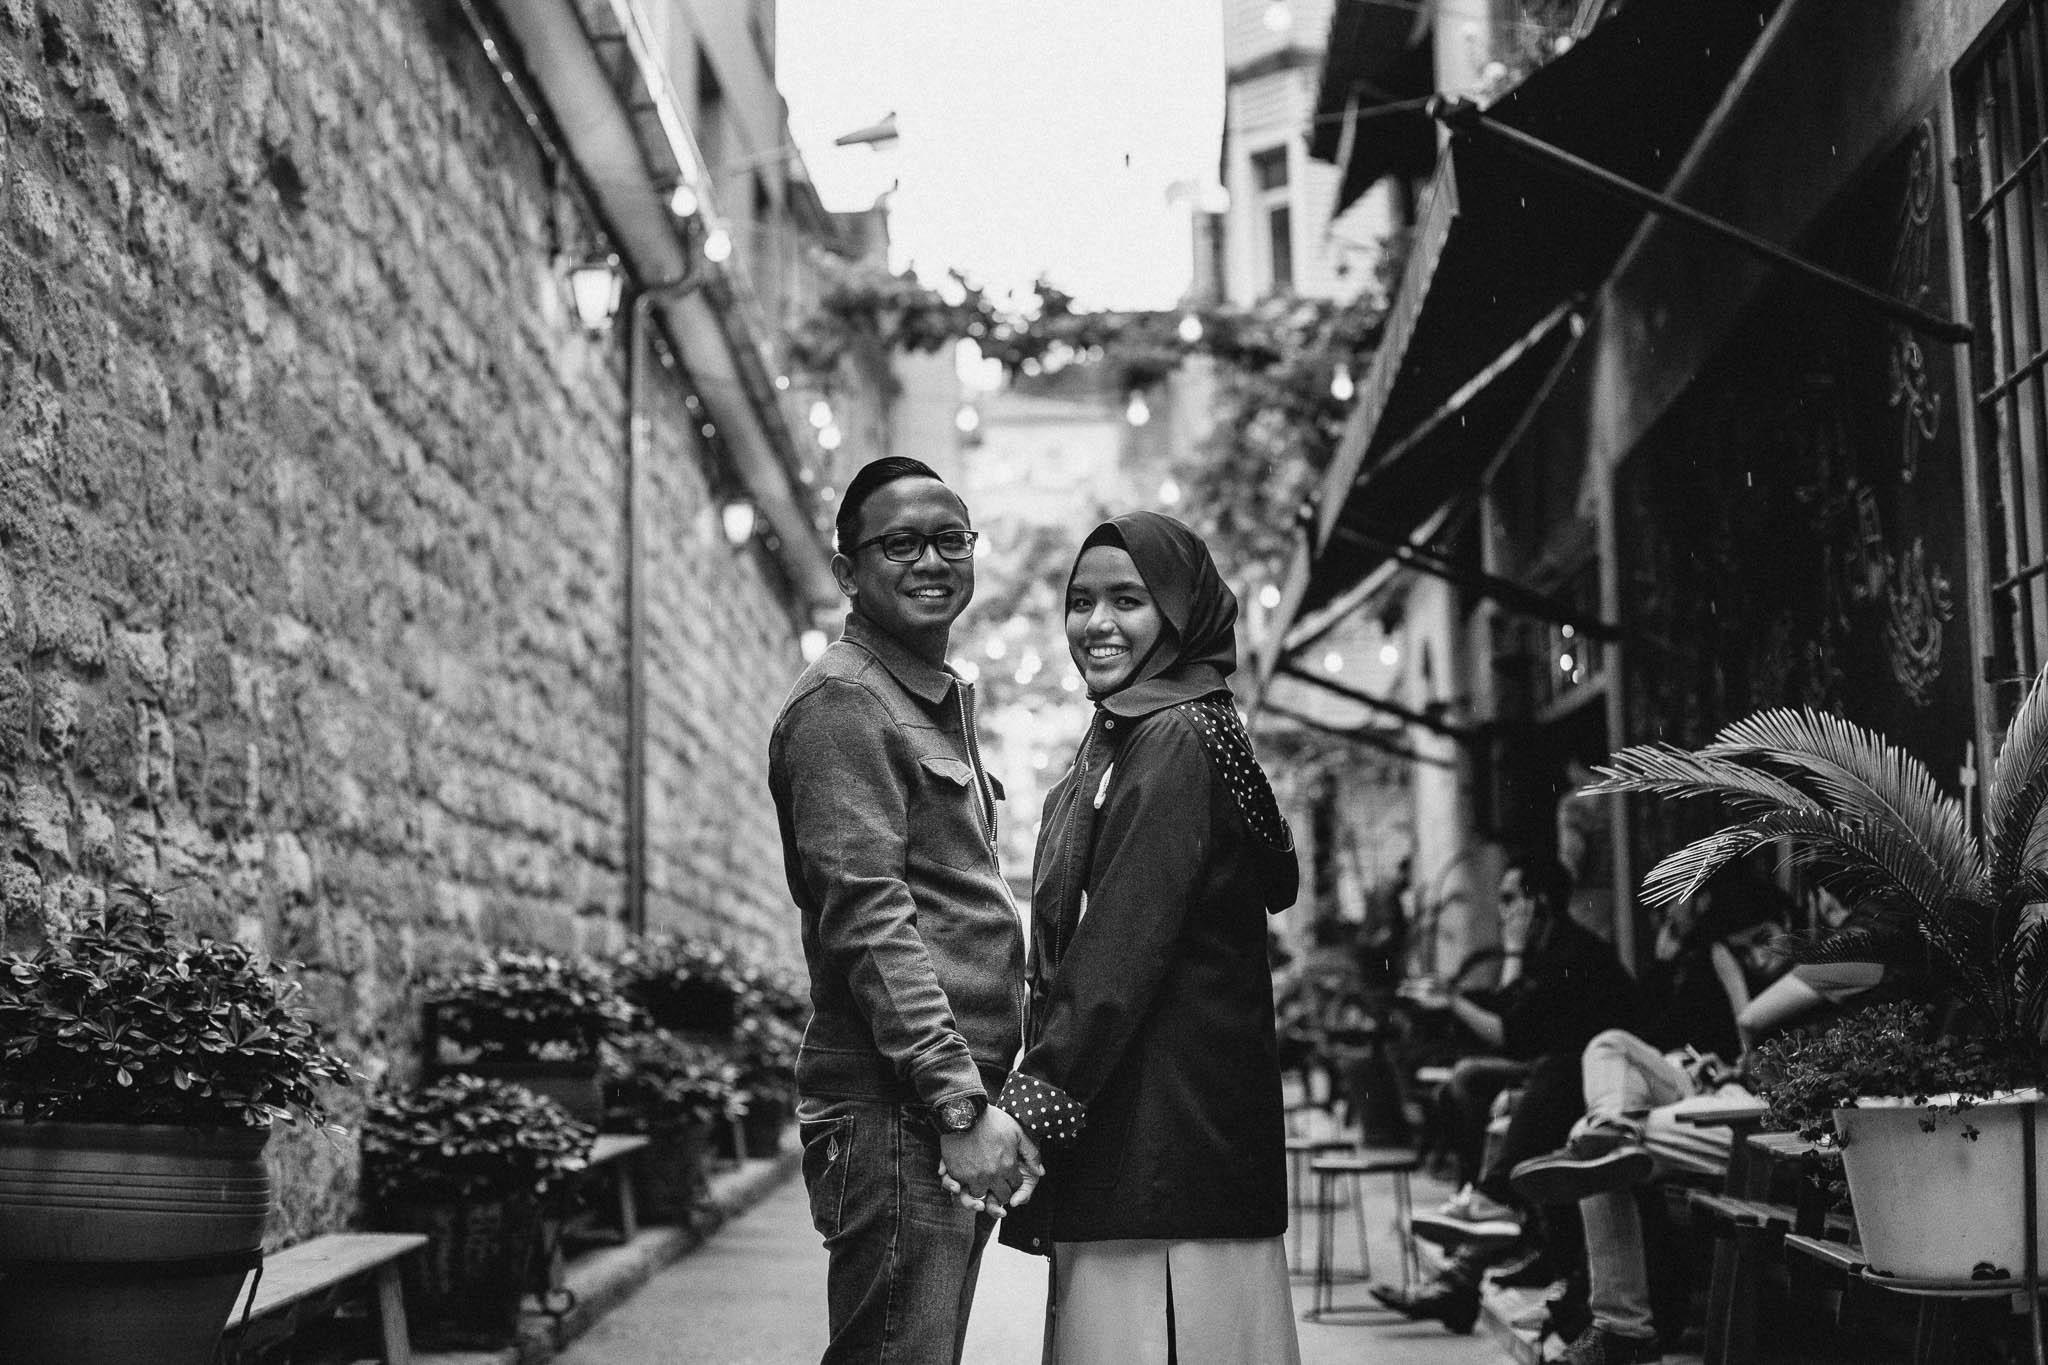 singapore-wedding-photographer-dzul-isma-istanbul-wmt-38.jpg